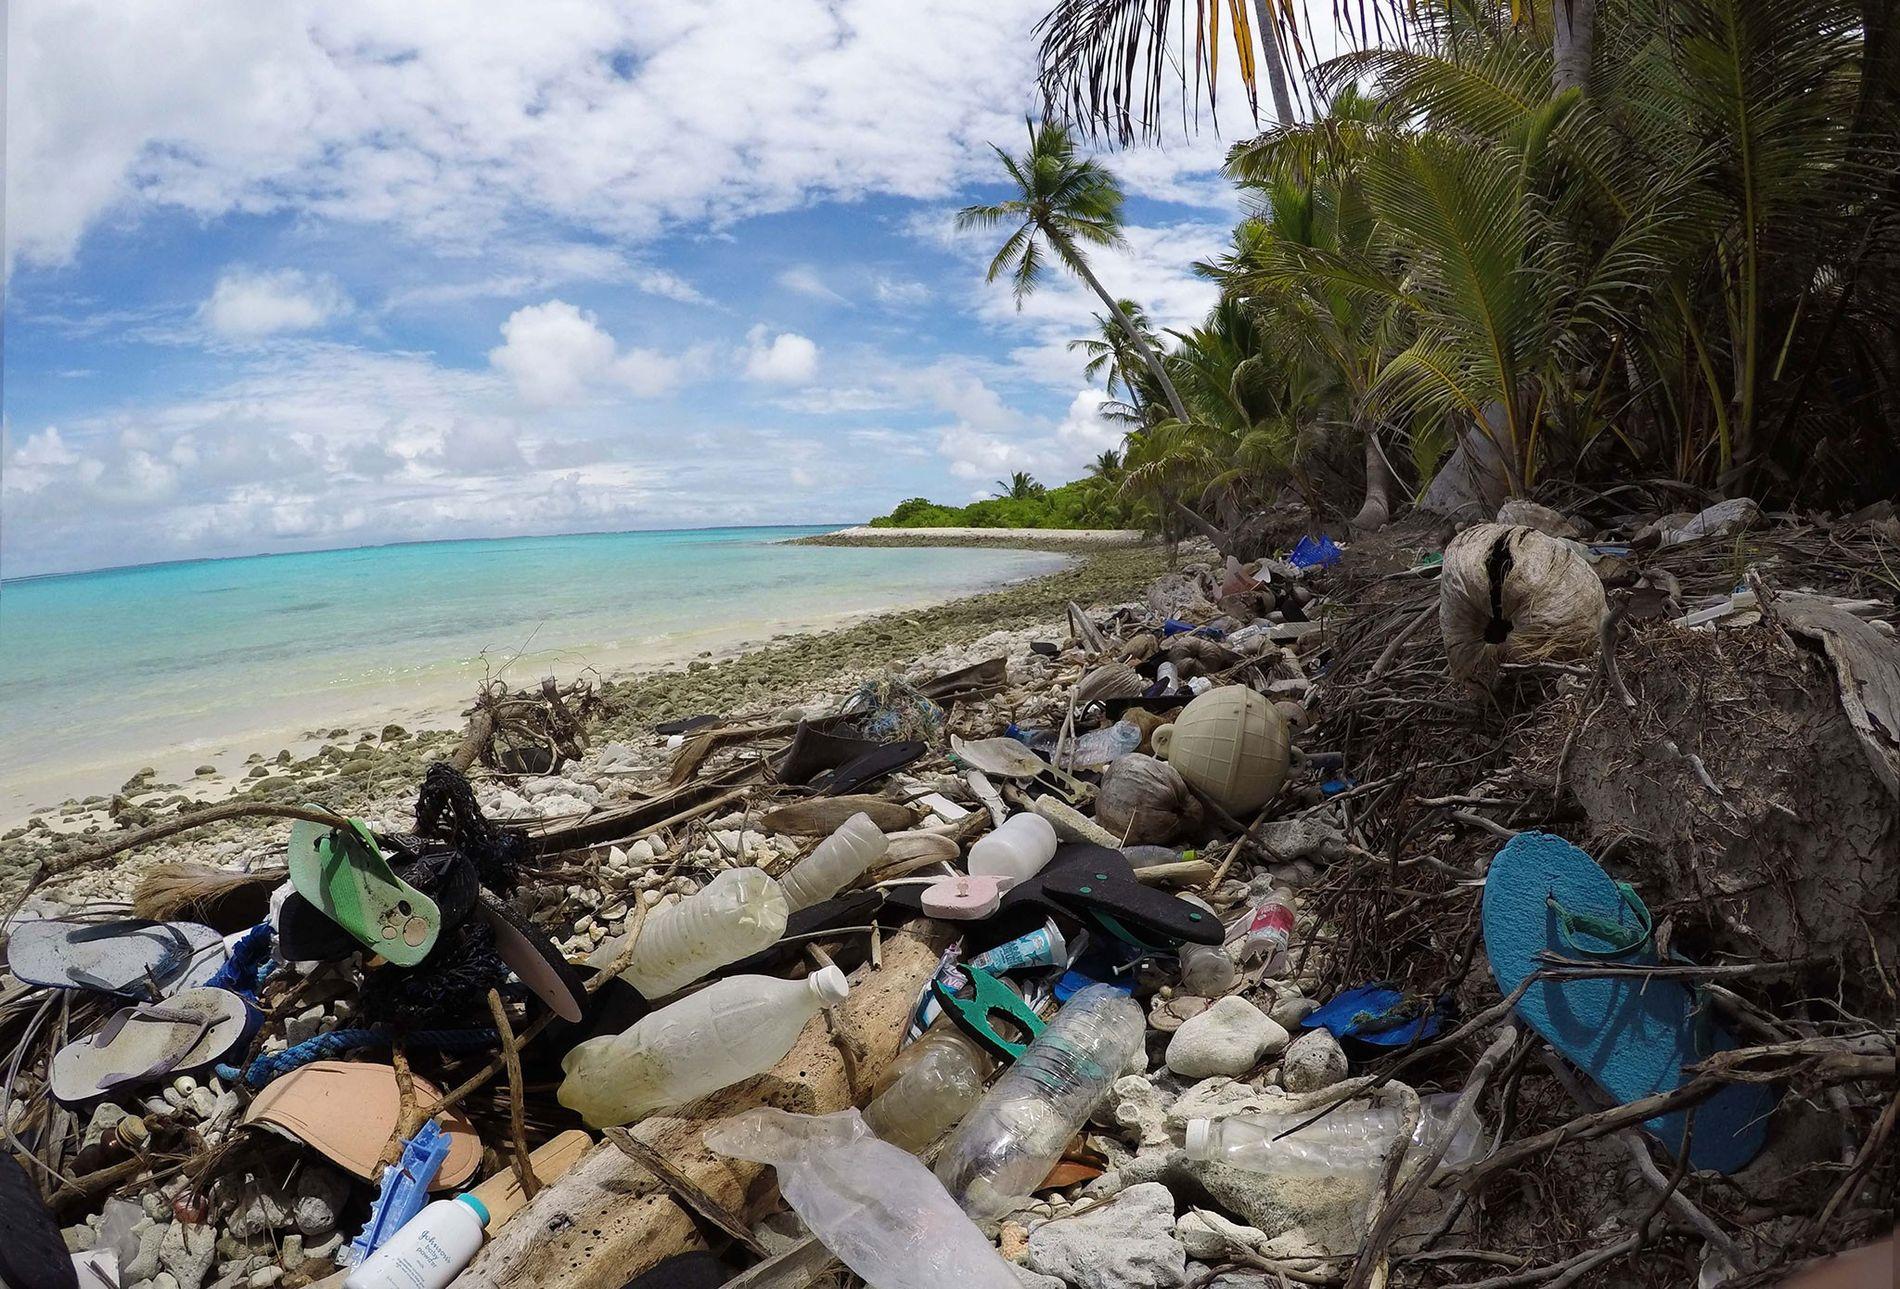 Plastic debris clogs the north side of Direction Island, in Australia.